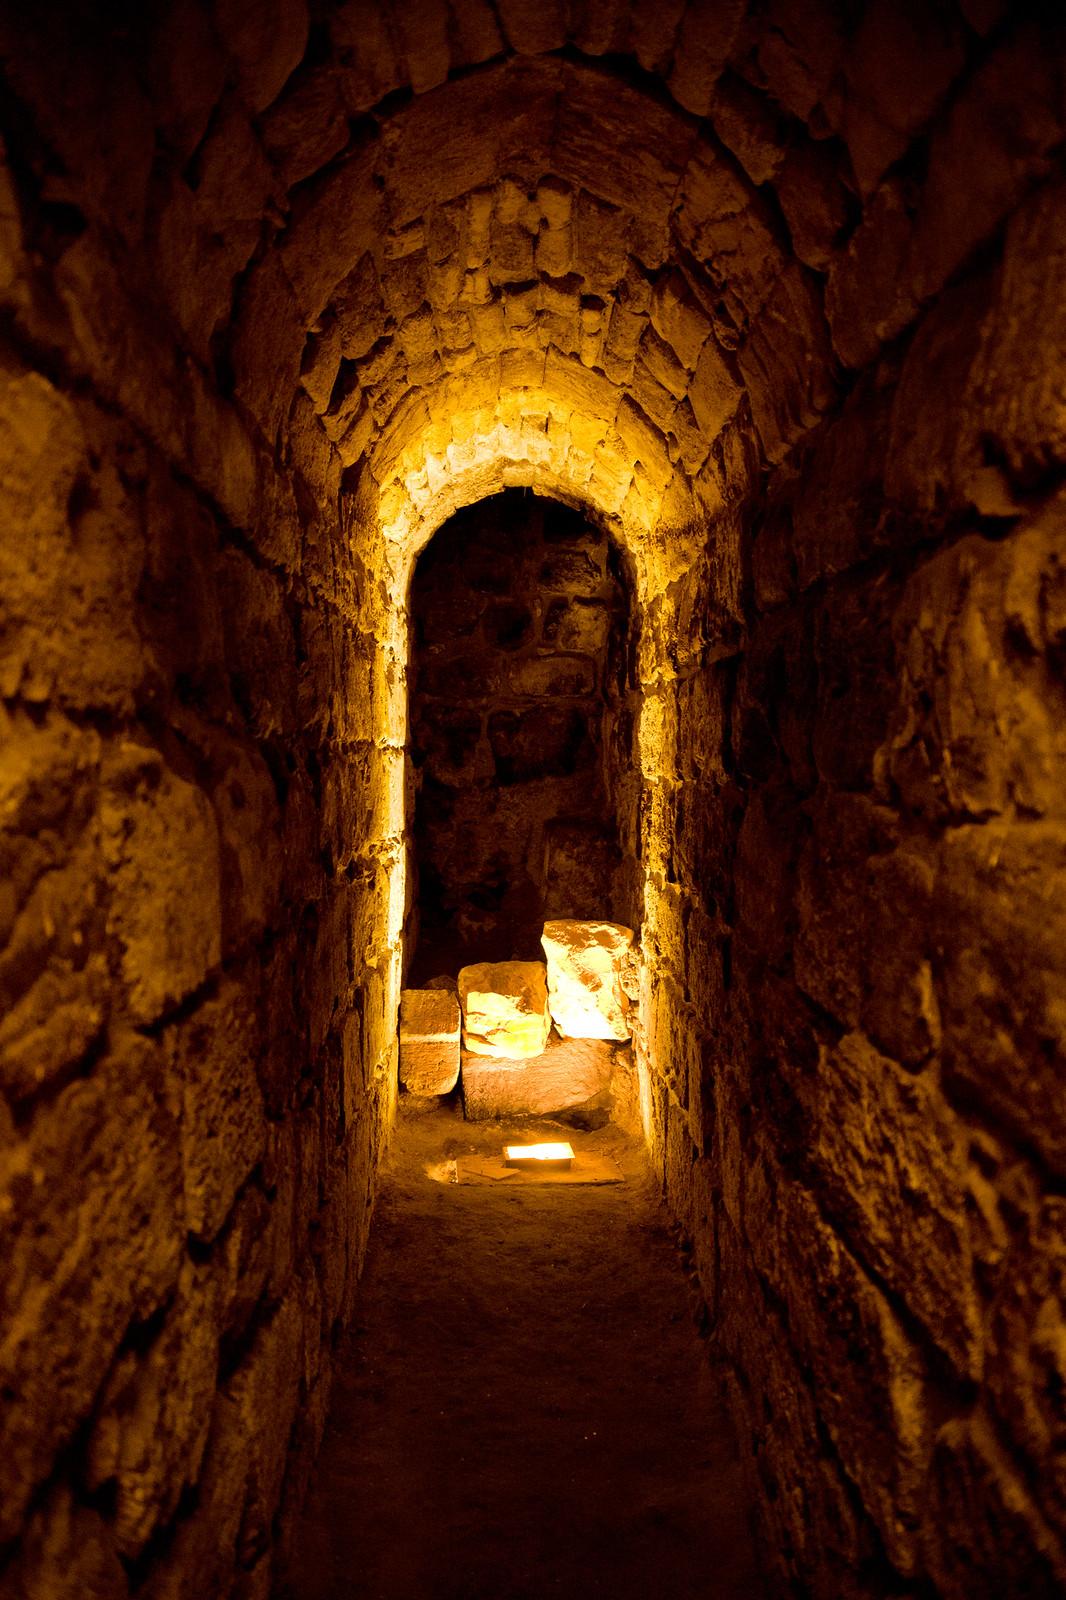 Jerusalem_Western Wall Tunnels_4_Noam Chen_IMOT